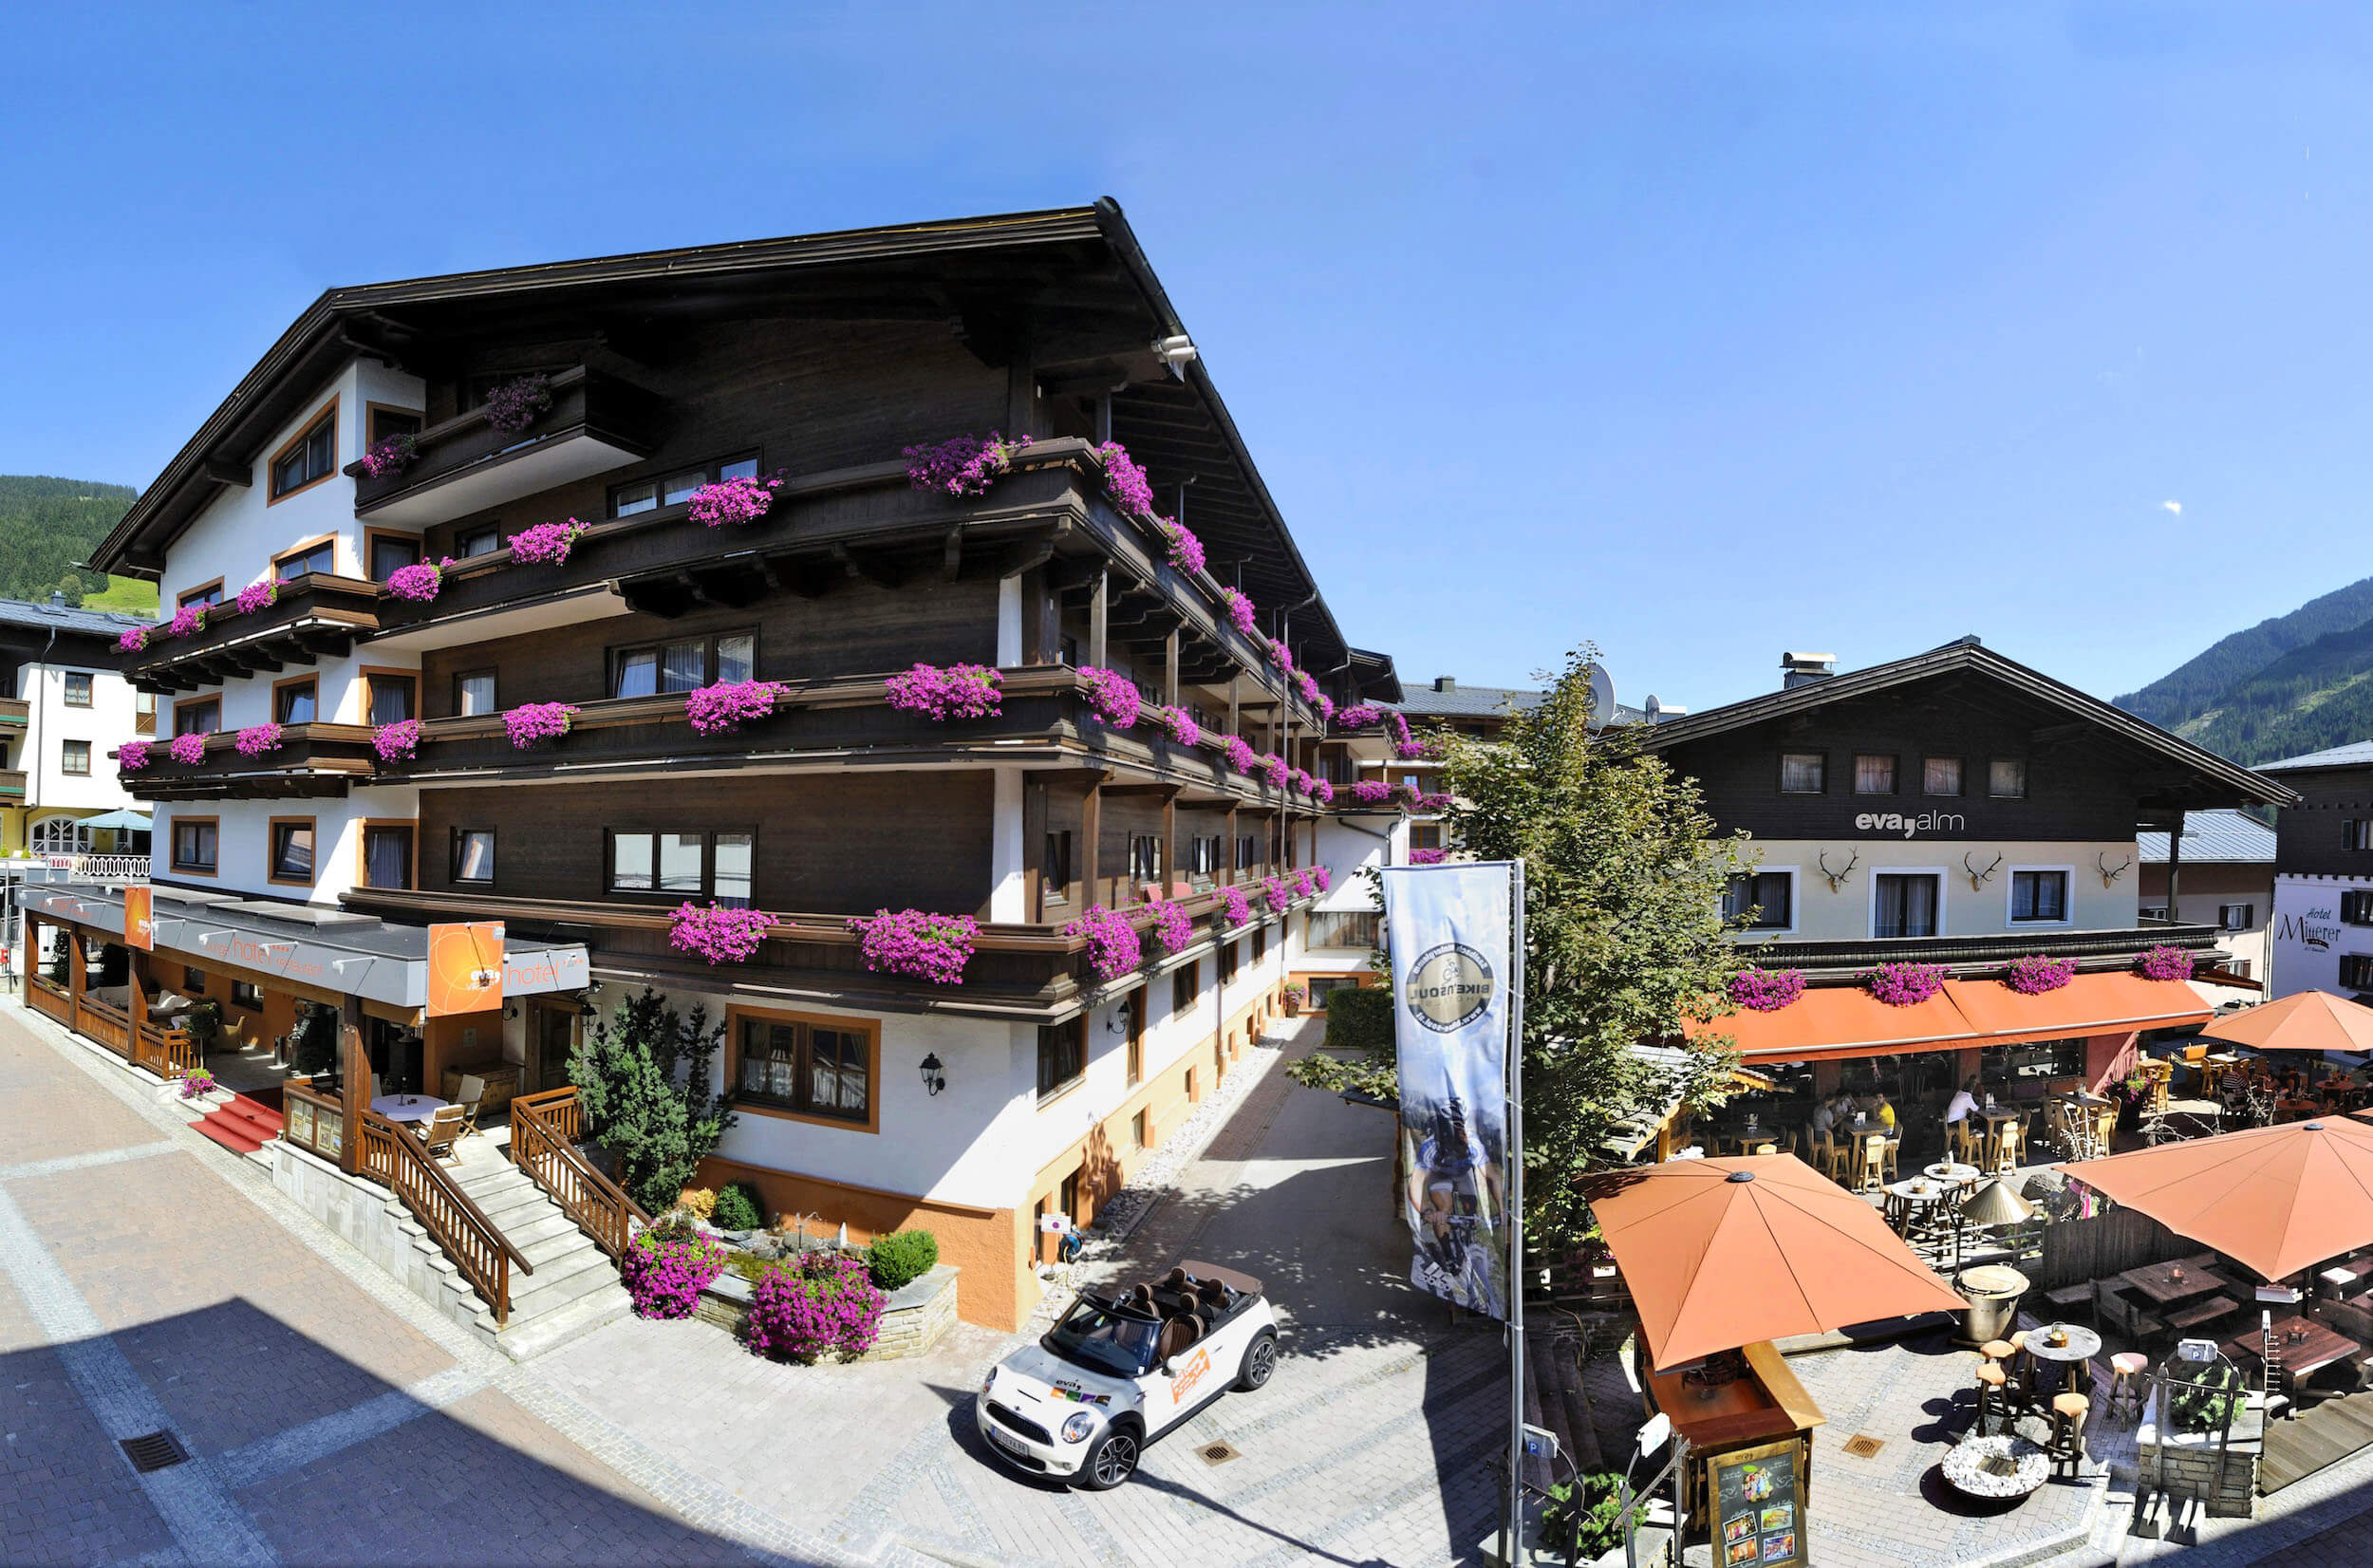 Hotel Eva Village in Saalbach